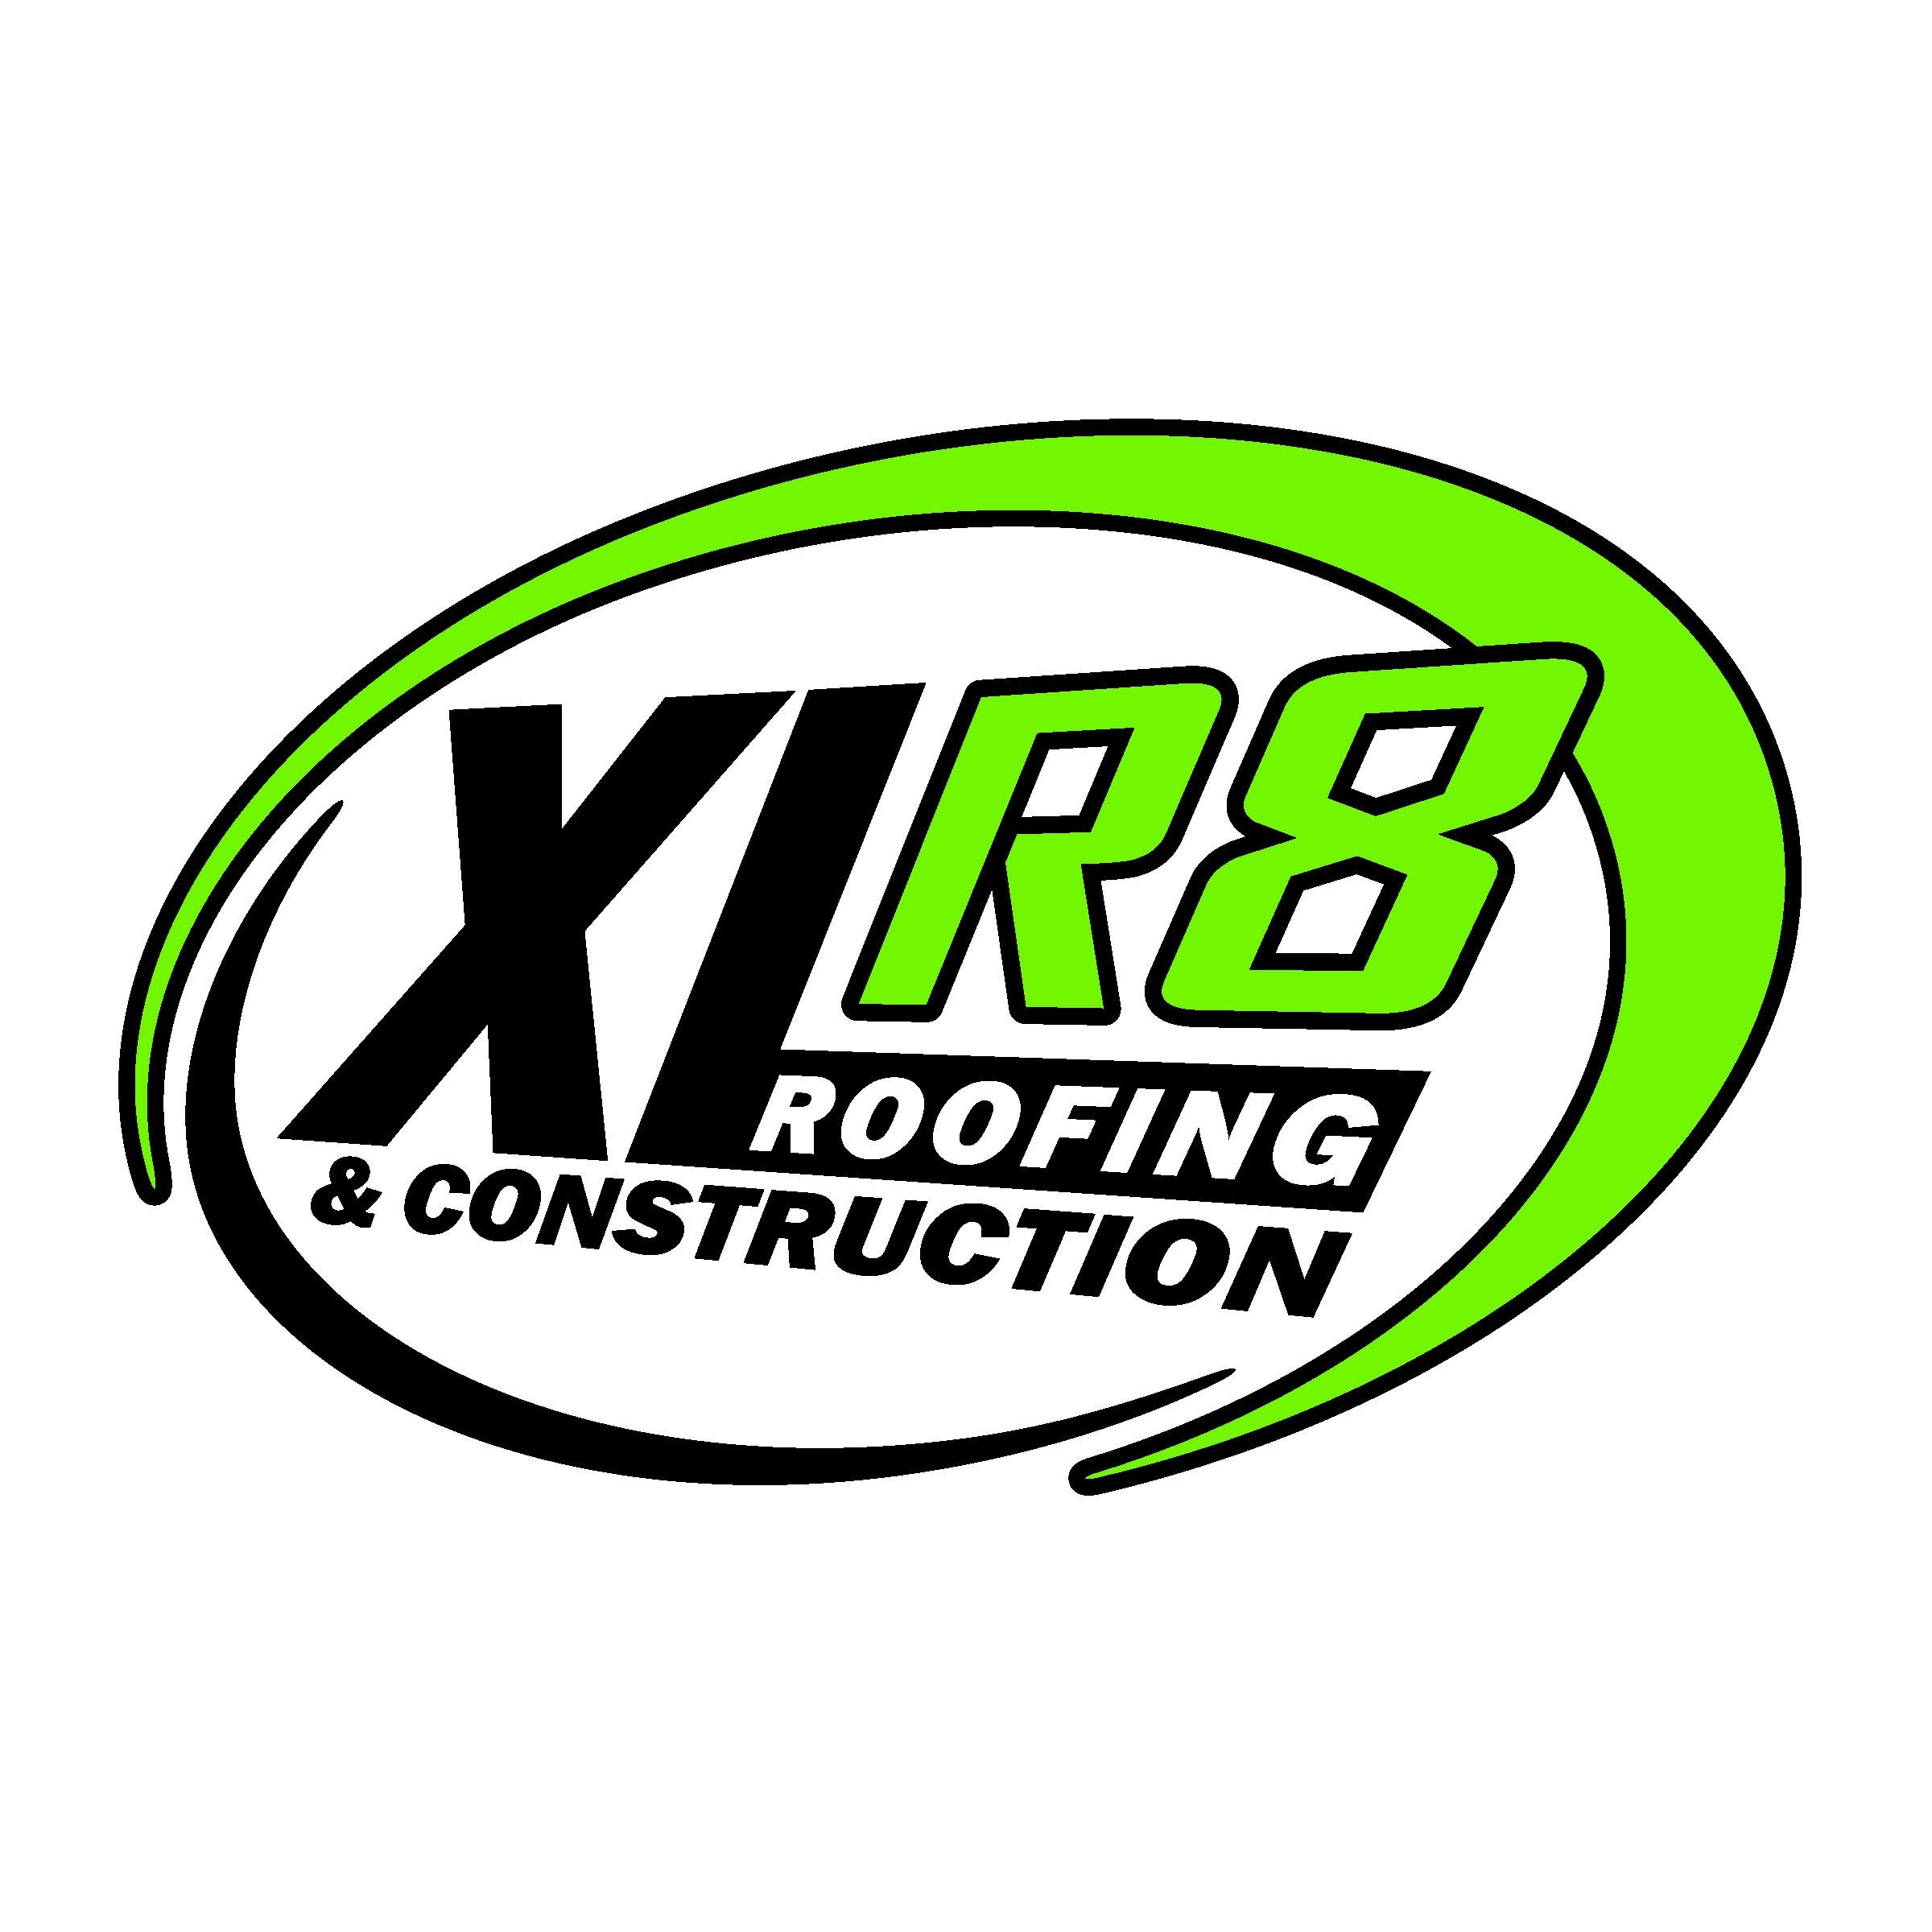 XLR8 Roofing & Construction, LLC. image 4